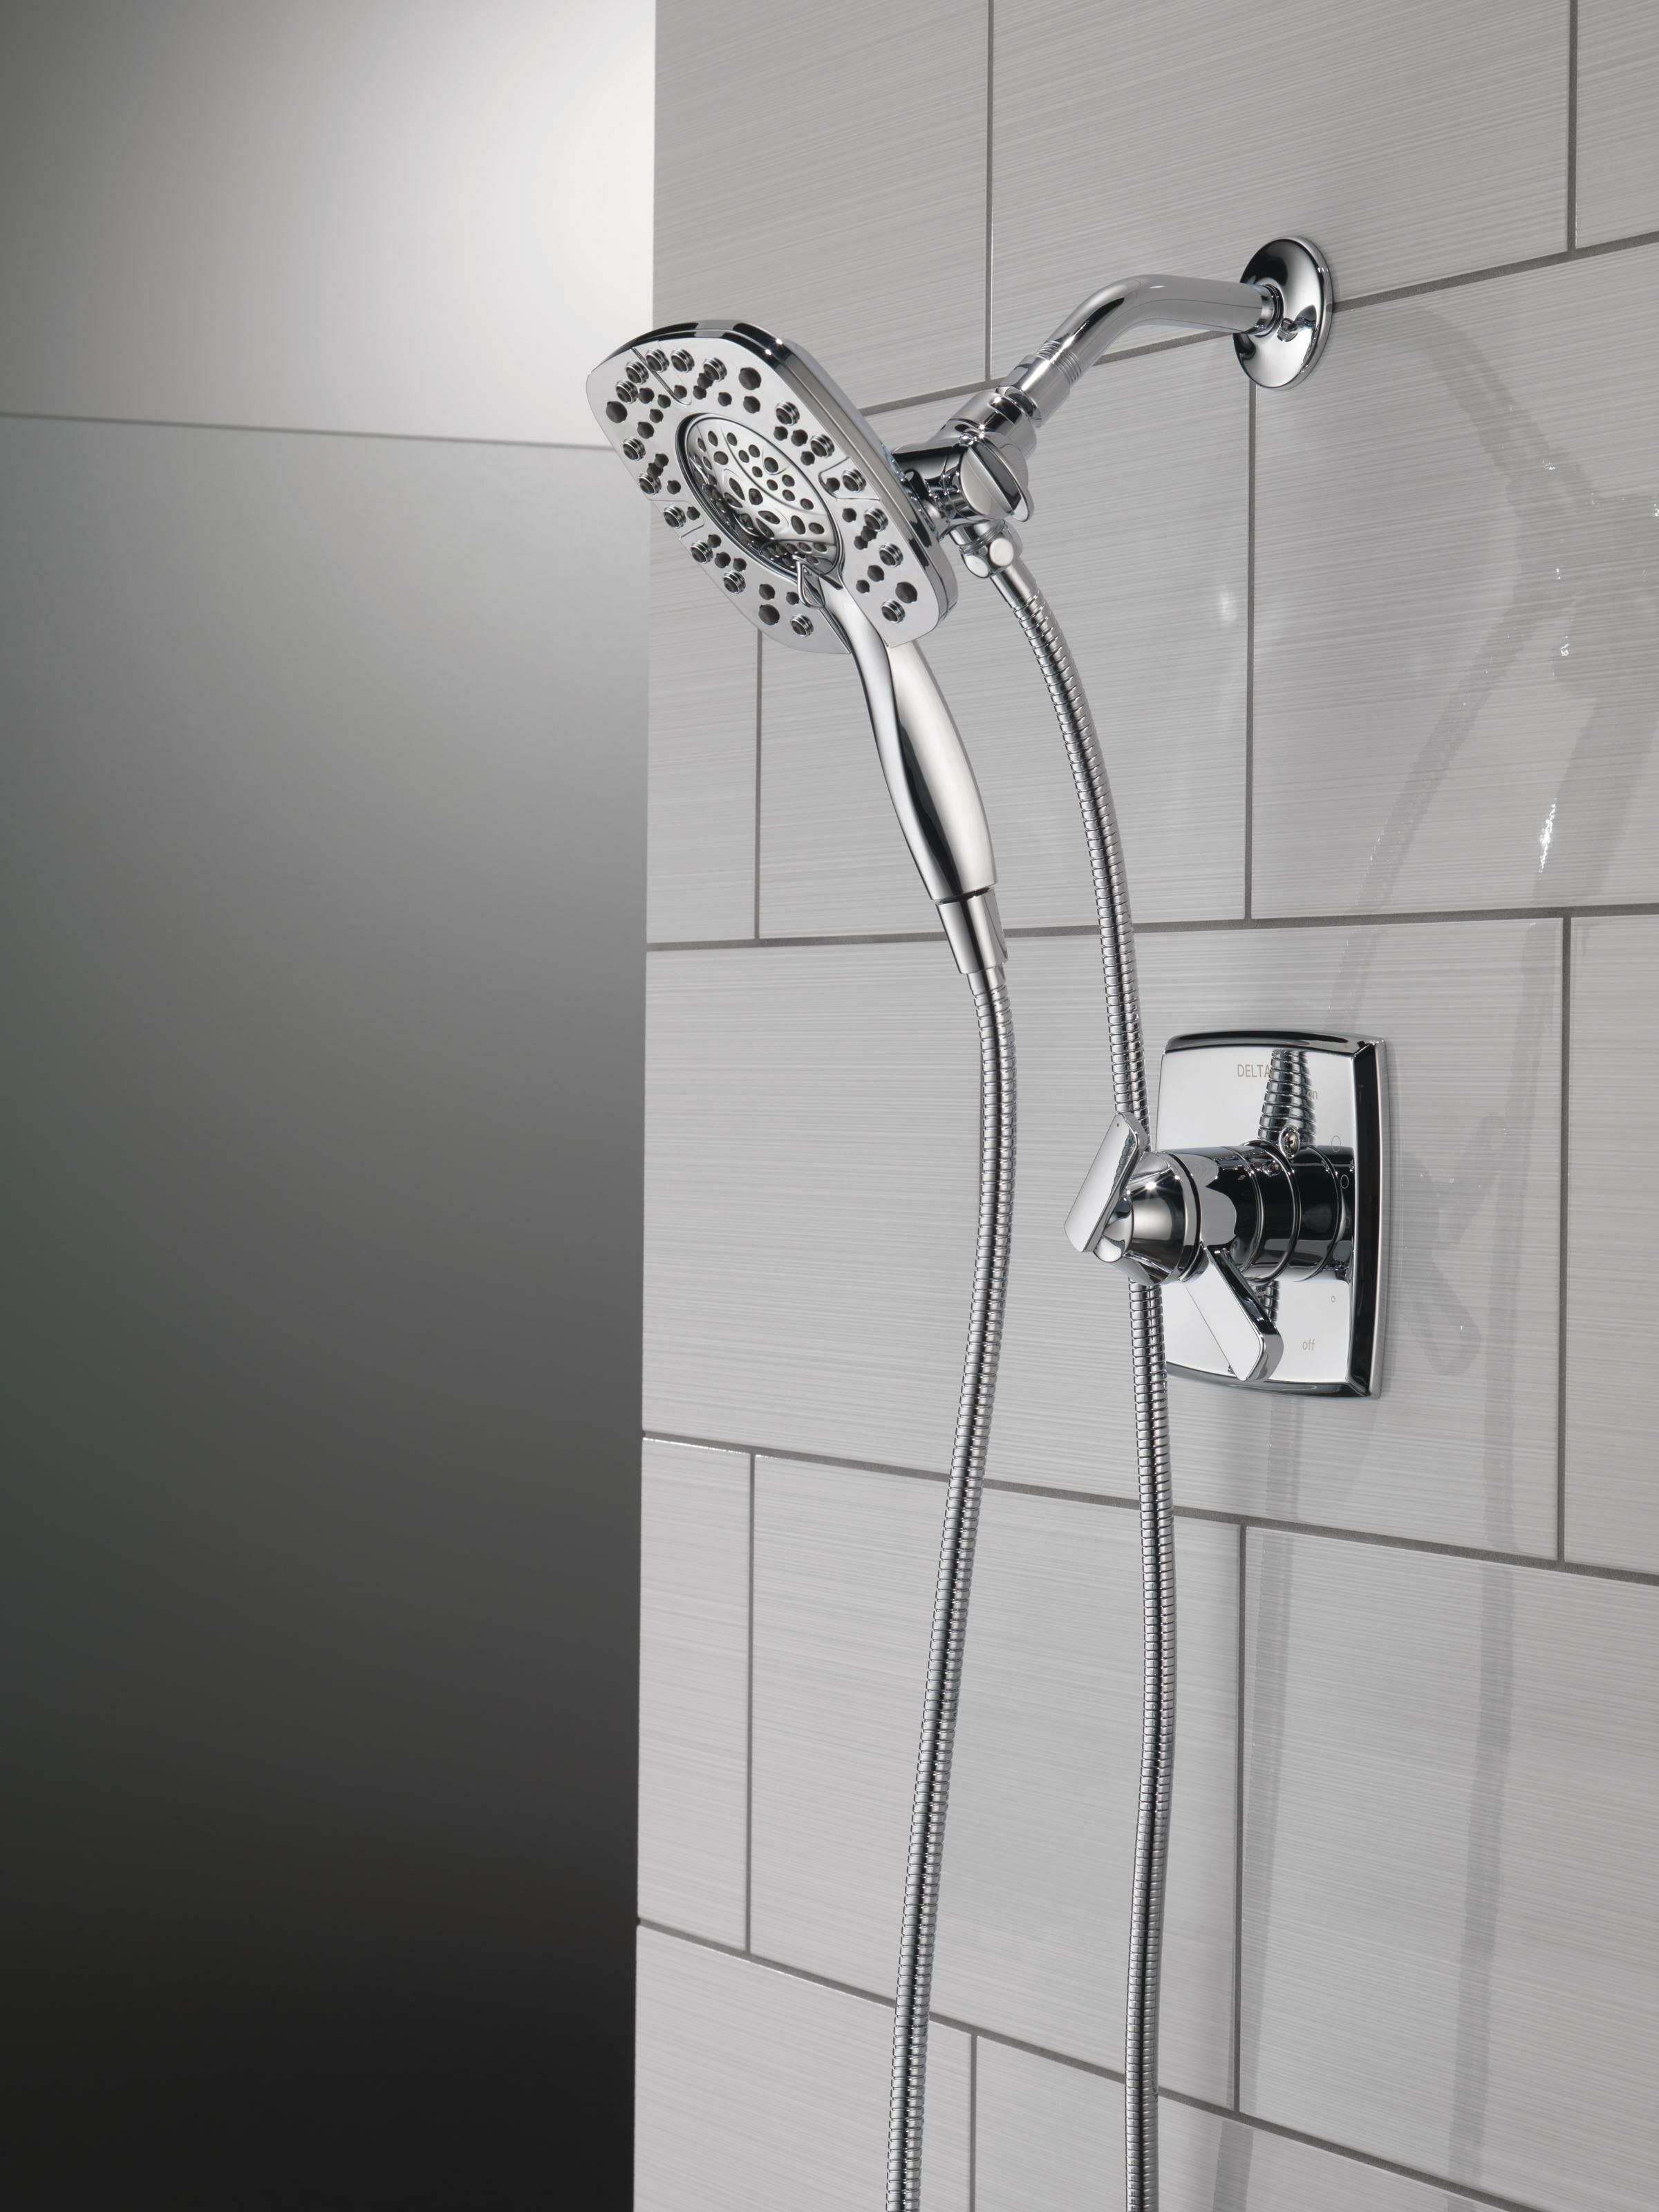 Shower rain Shower Shower Set Shower Head Shower Rod Hand Shower Shower Hose 642